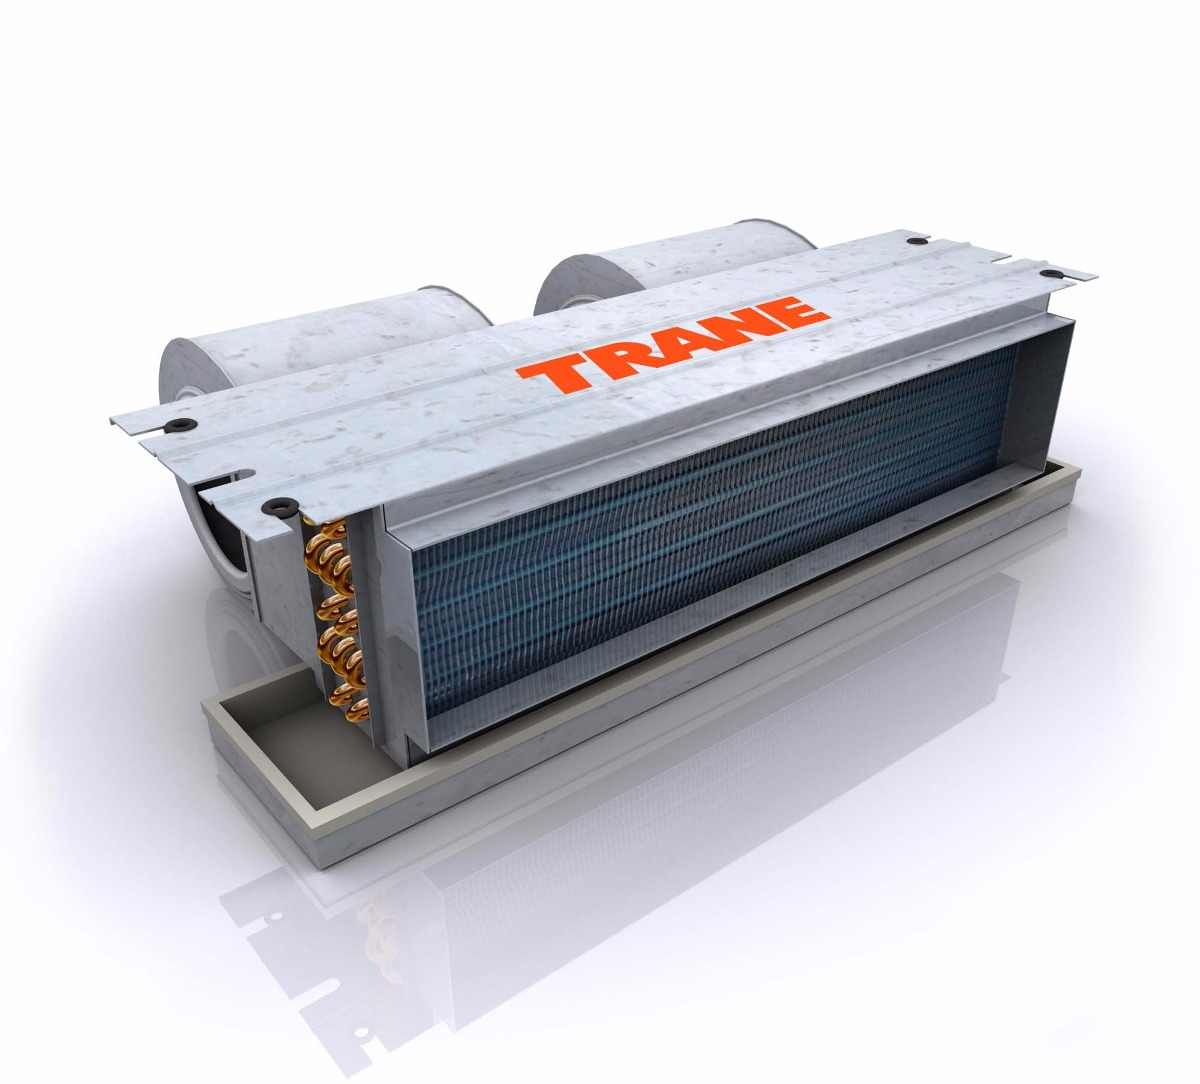 Fan Coil Trane De 60 000 Btu Mcd560 Bs 1 95 En Mercado